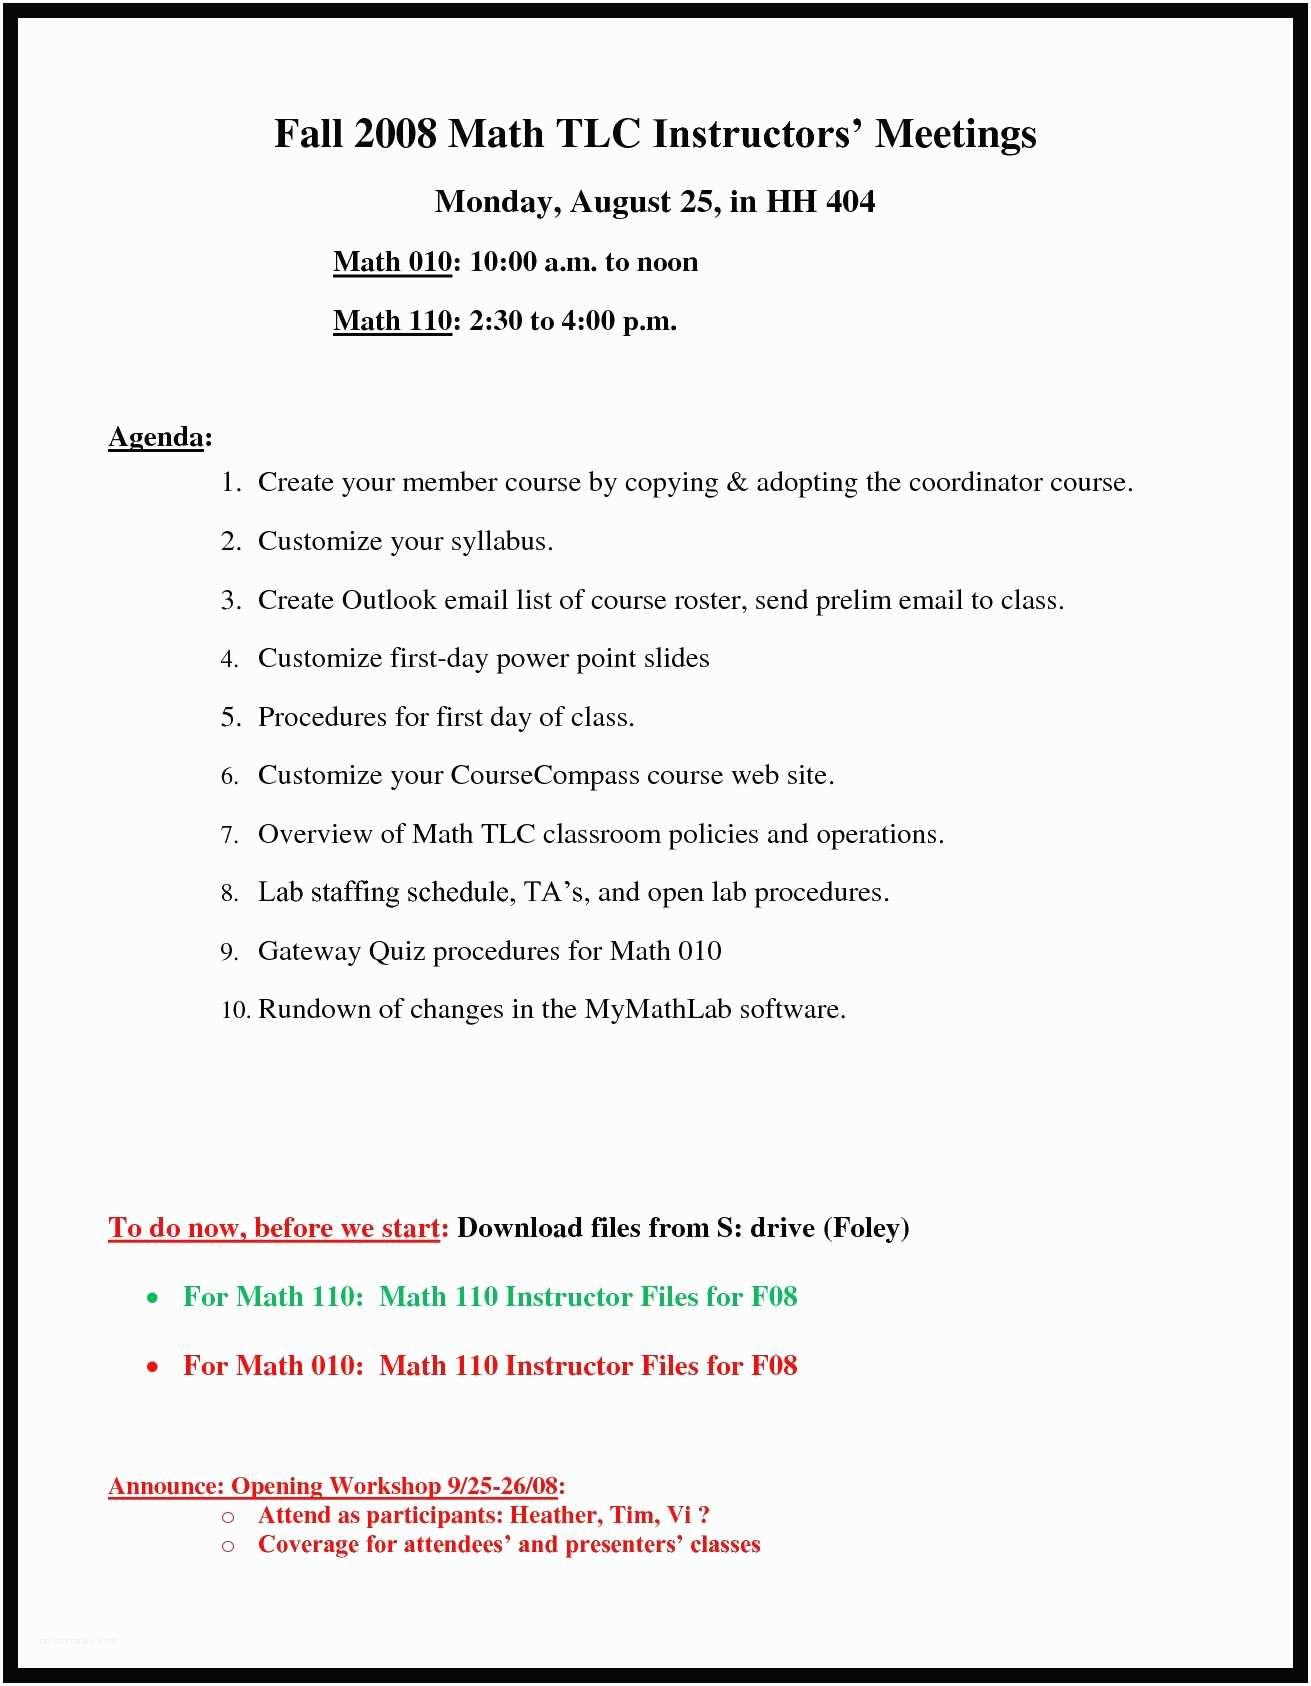 Email Wedding Shower Invitations Sample Meeting Invitation Email Elegant Business Meeting